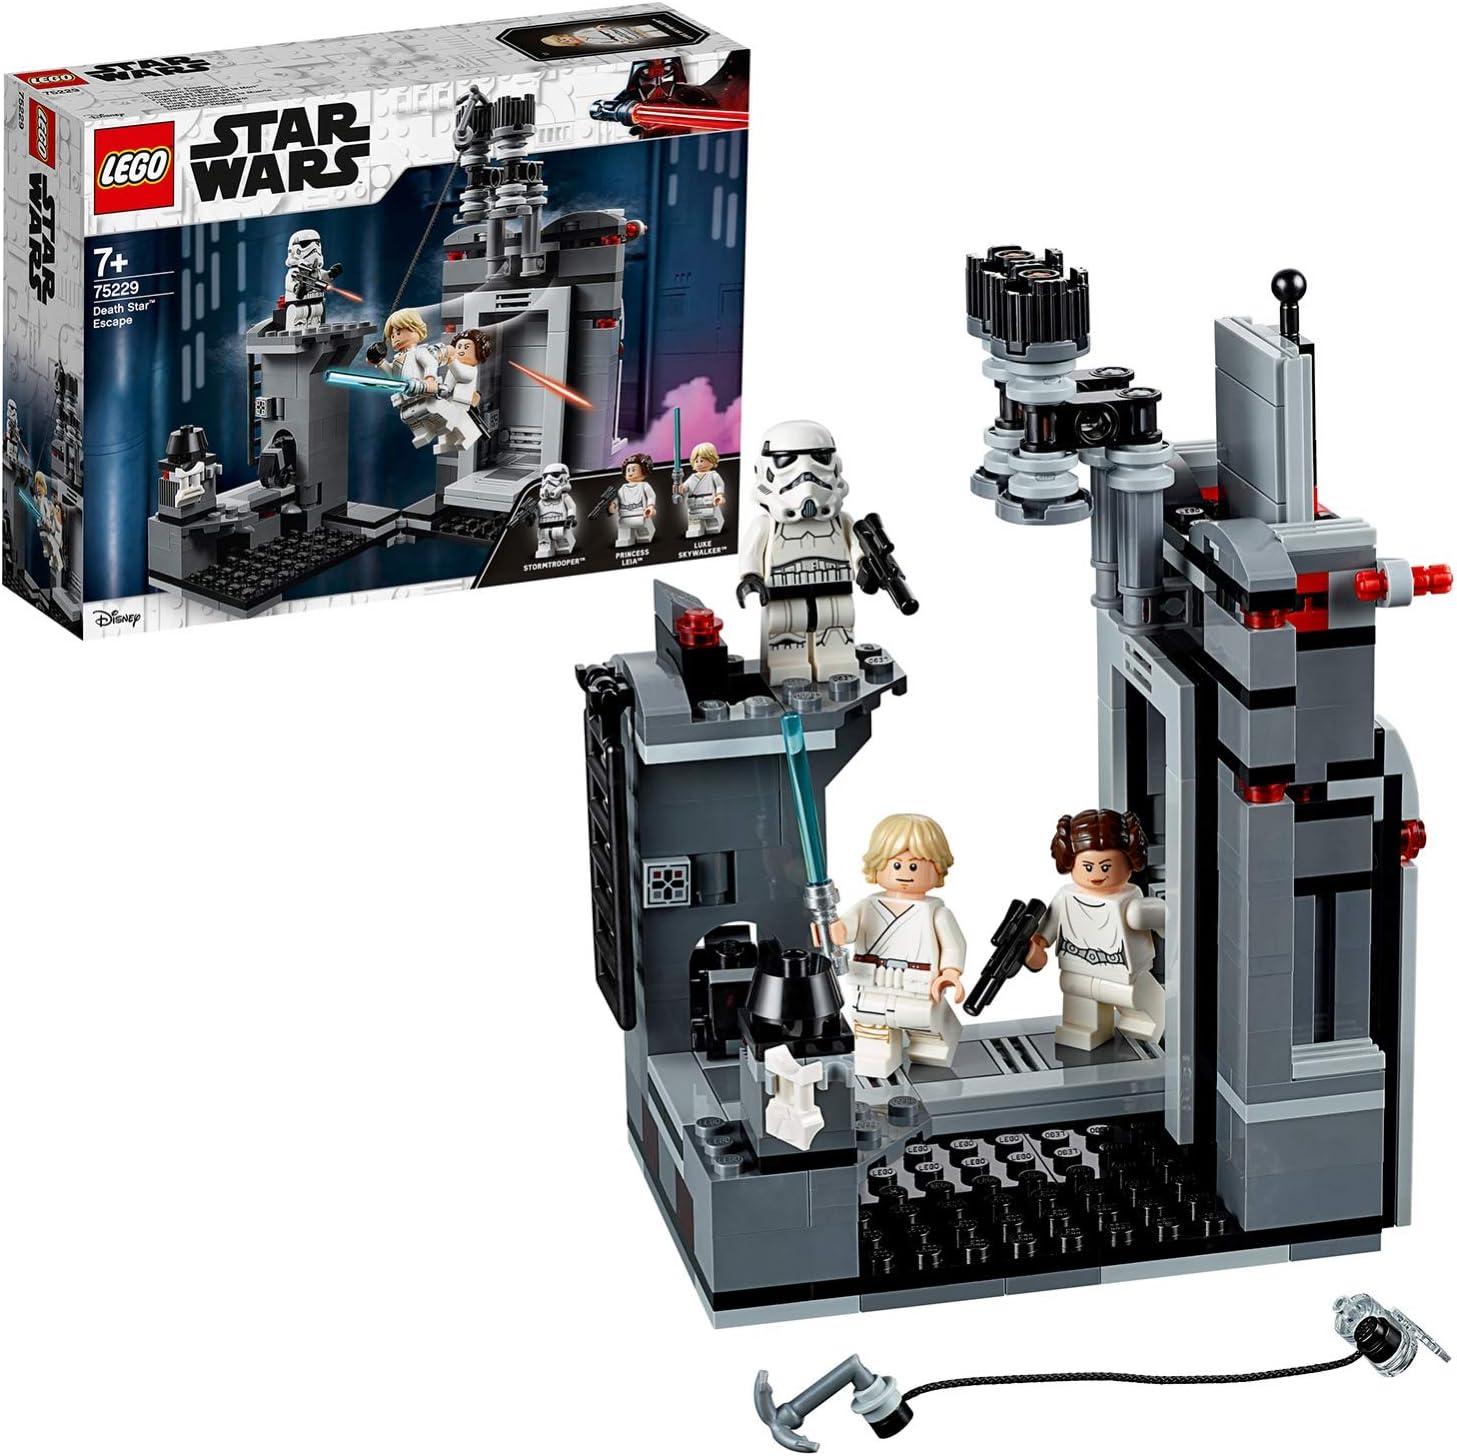 LEGO Star Wars - Huida de la Estrella de la Muerte, juguete de ...